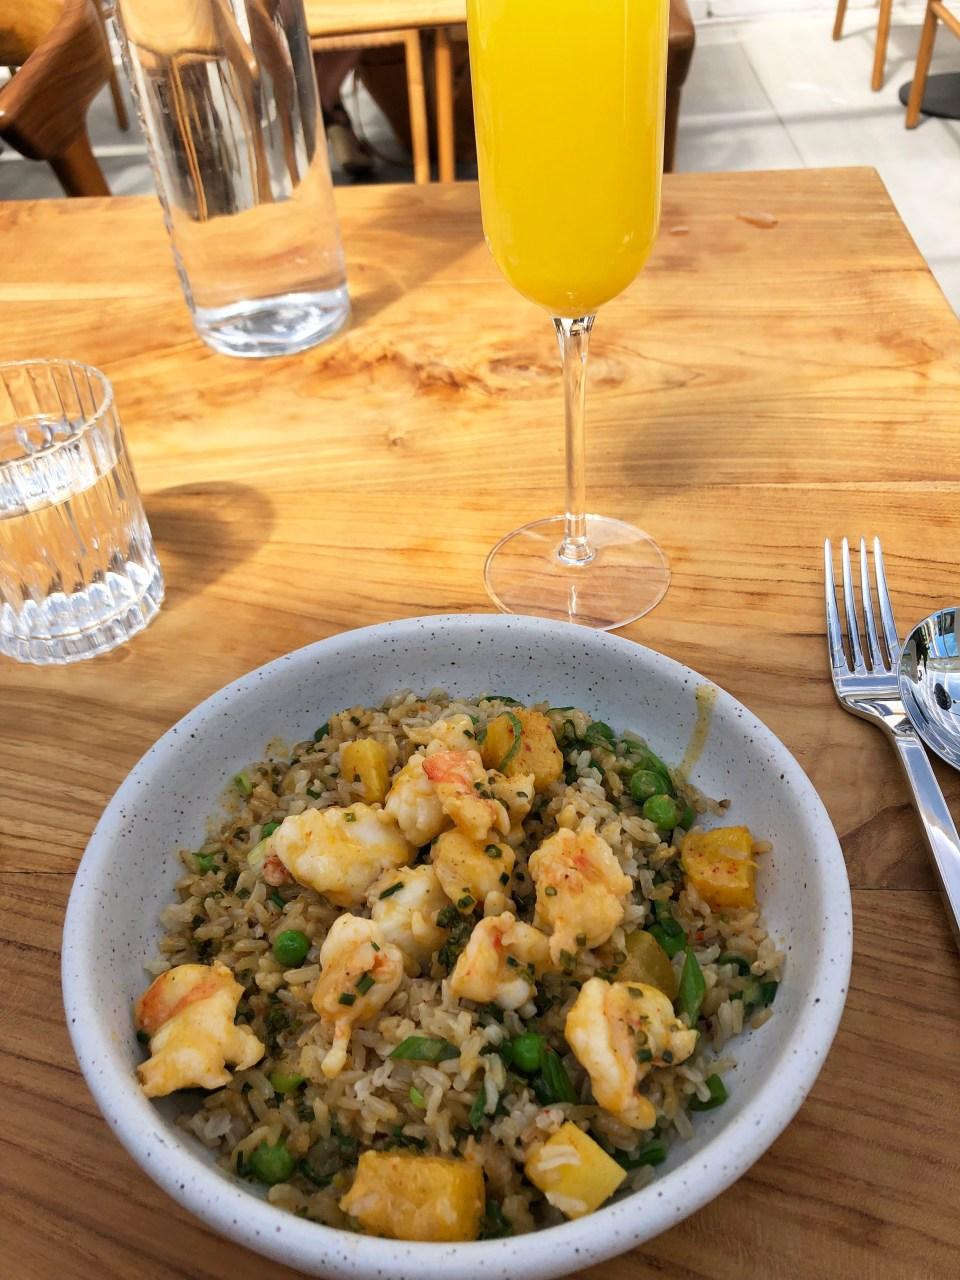 Lapeer - Chili-Garlic Shrimp & Brown Rice